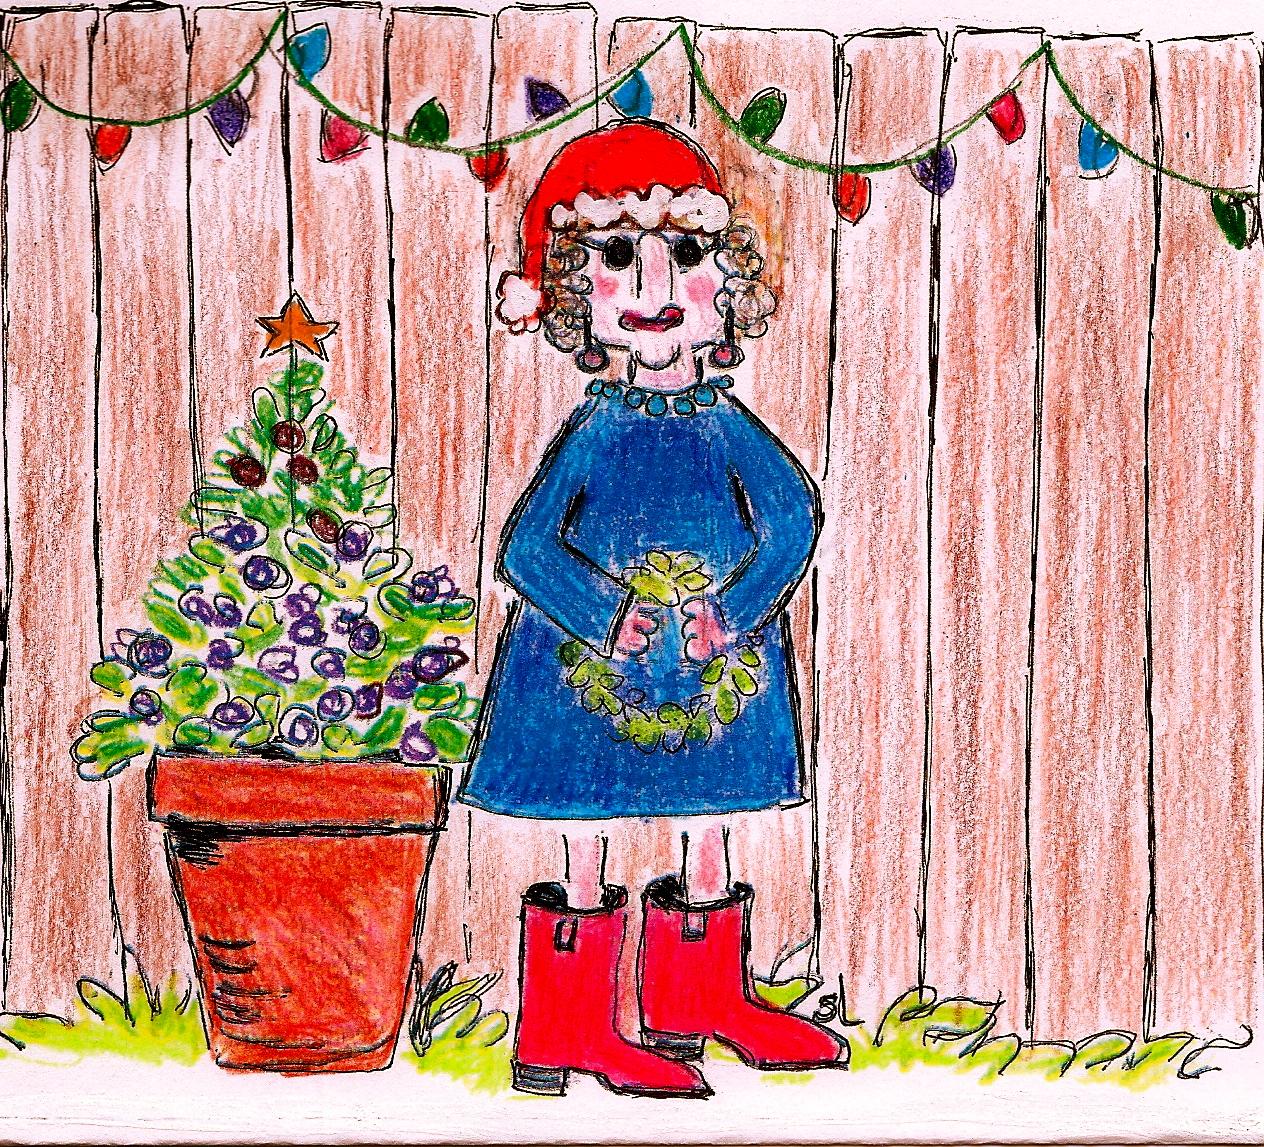 Westbury Gardens Christmas: The Brenham House: Christmas In Small Town Brenham, Texas